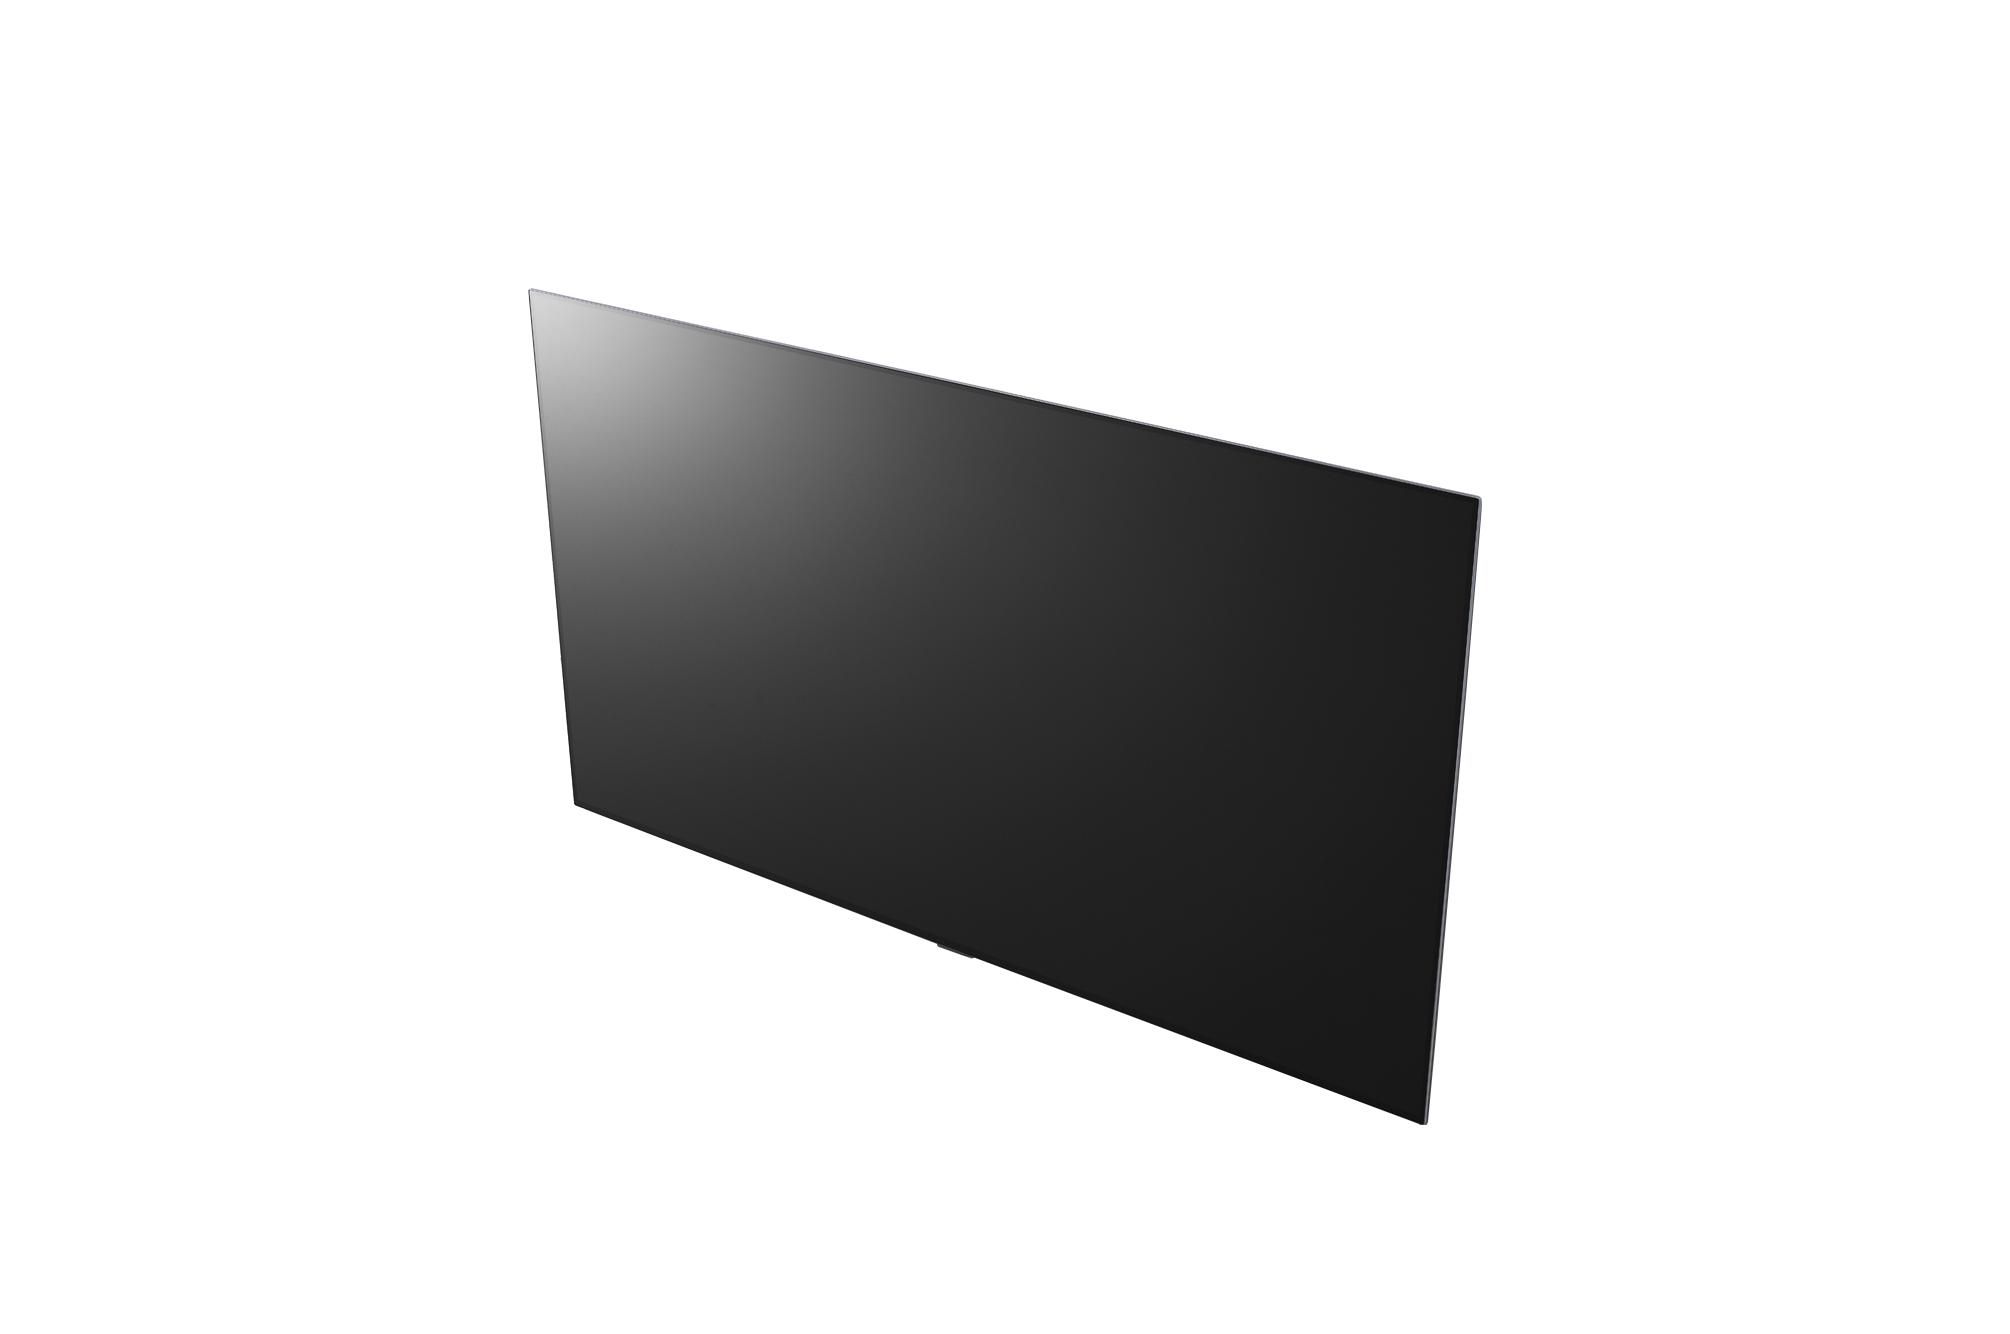 LG Pro:Centric SMART 65WS960H (EU) 8